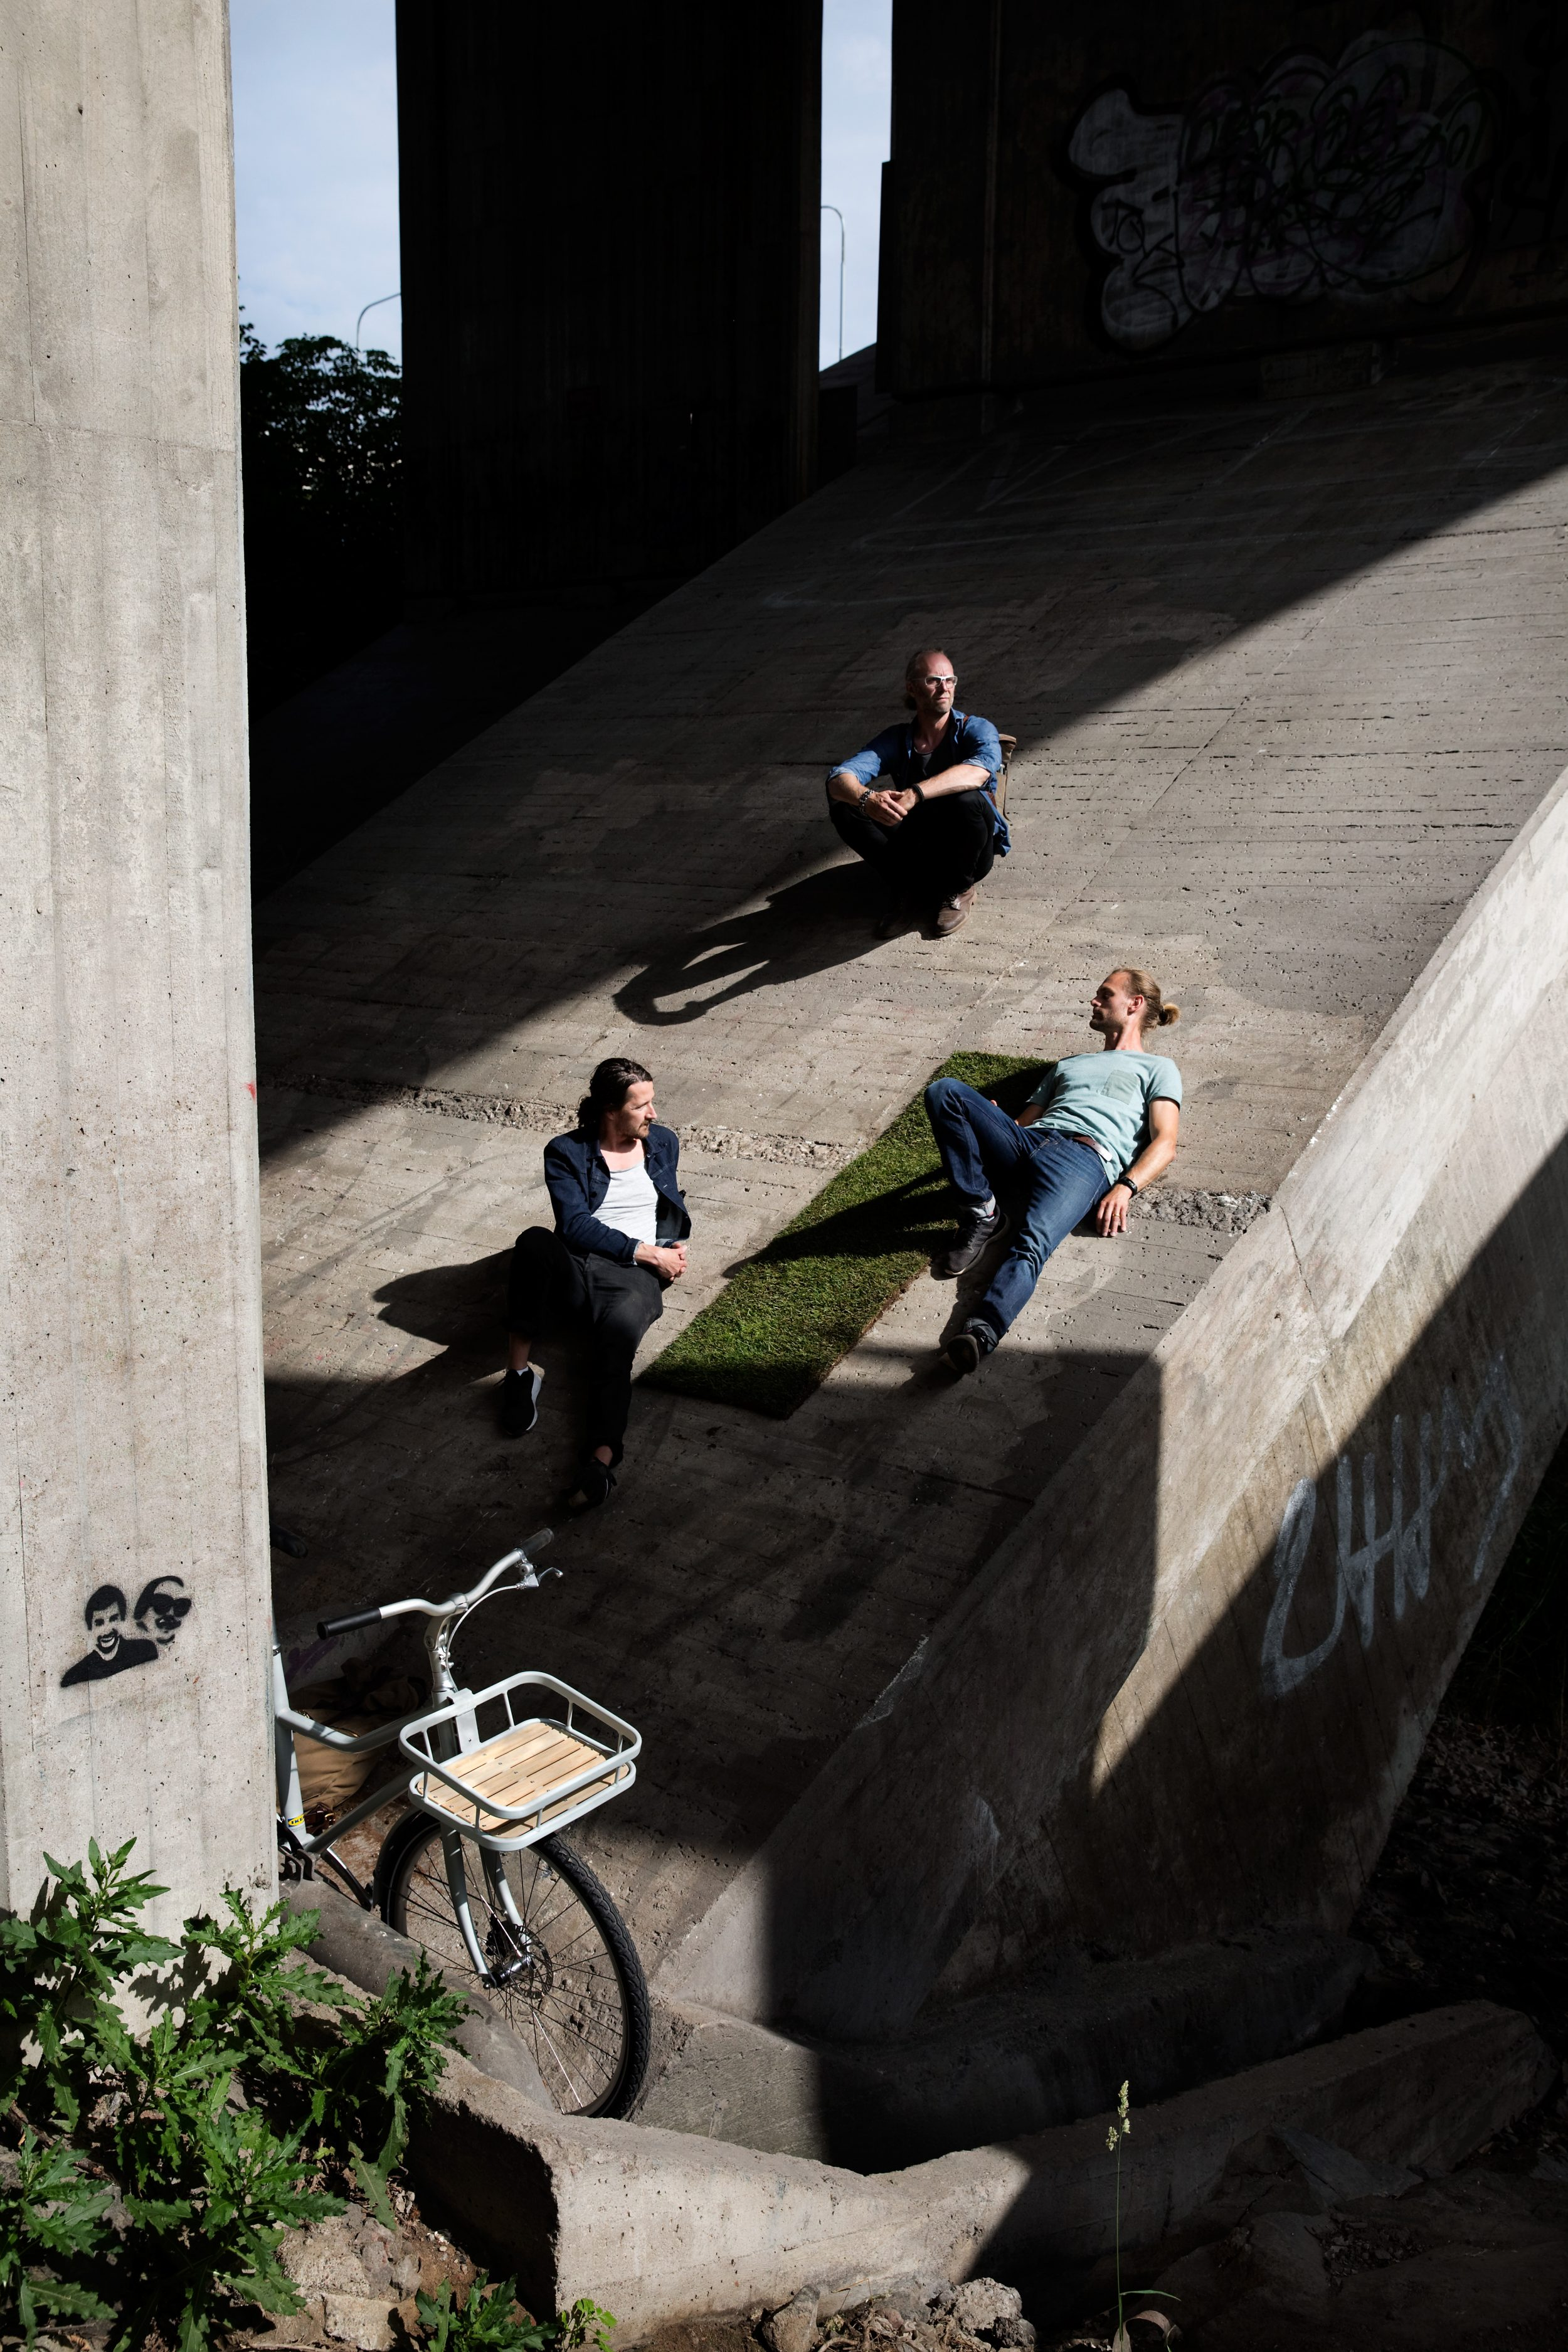 Three men lounging on the concrete foundation of a bridge.